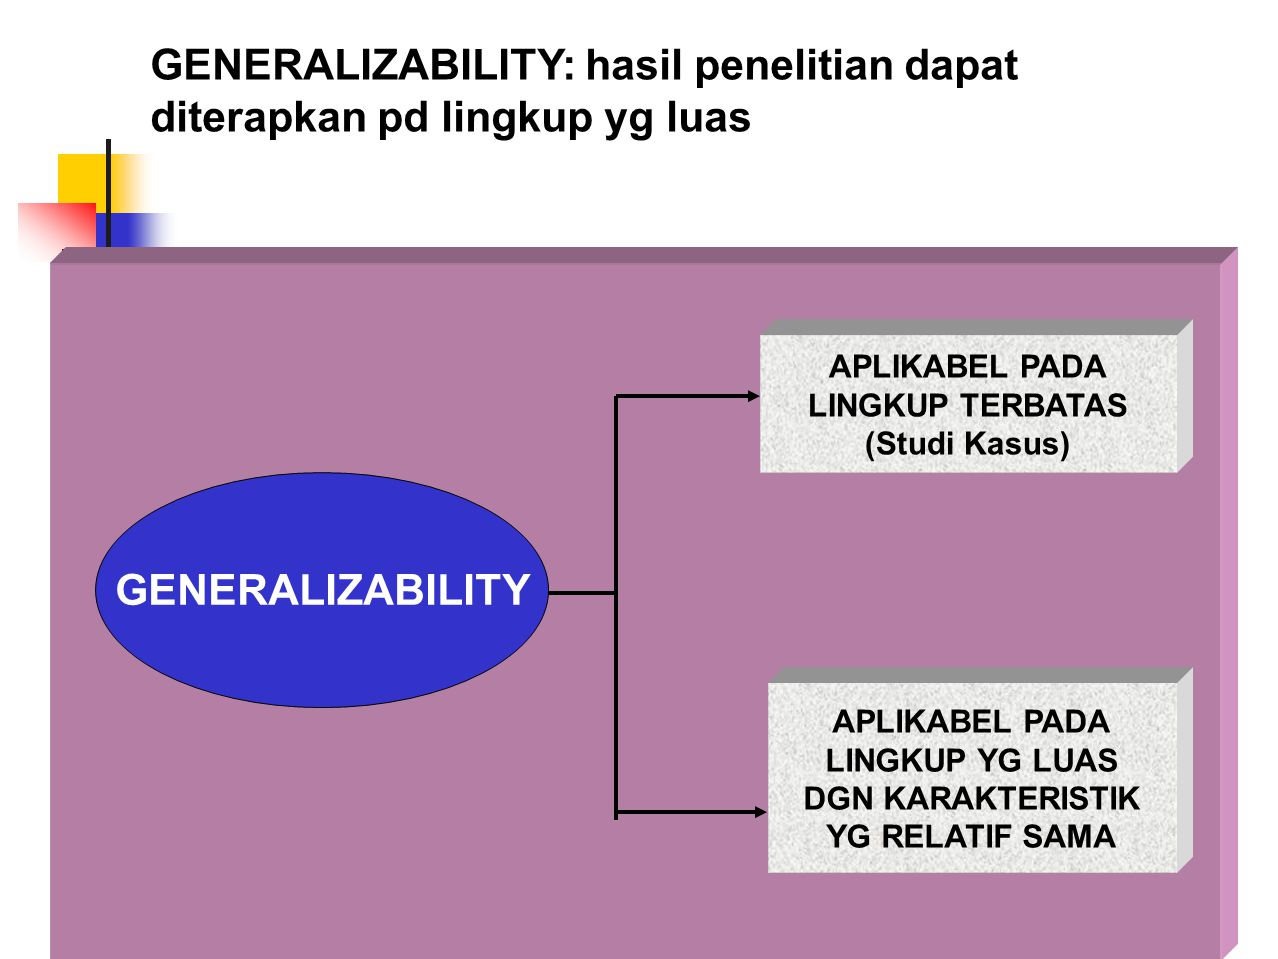 GENERALIZABILITY: hasil penelitian dapat diterapkan pd lingkup yg luas